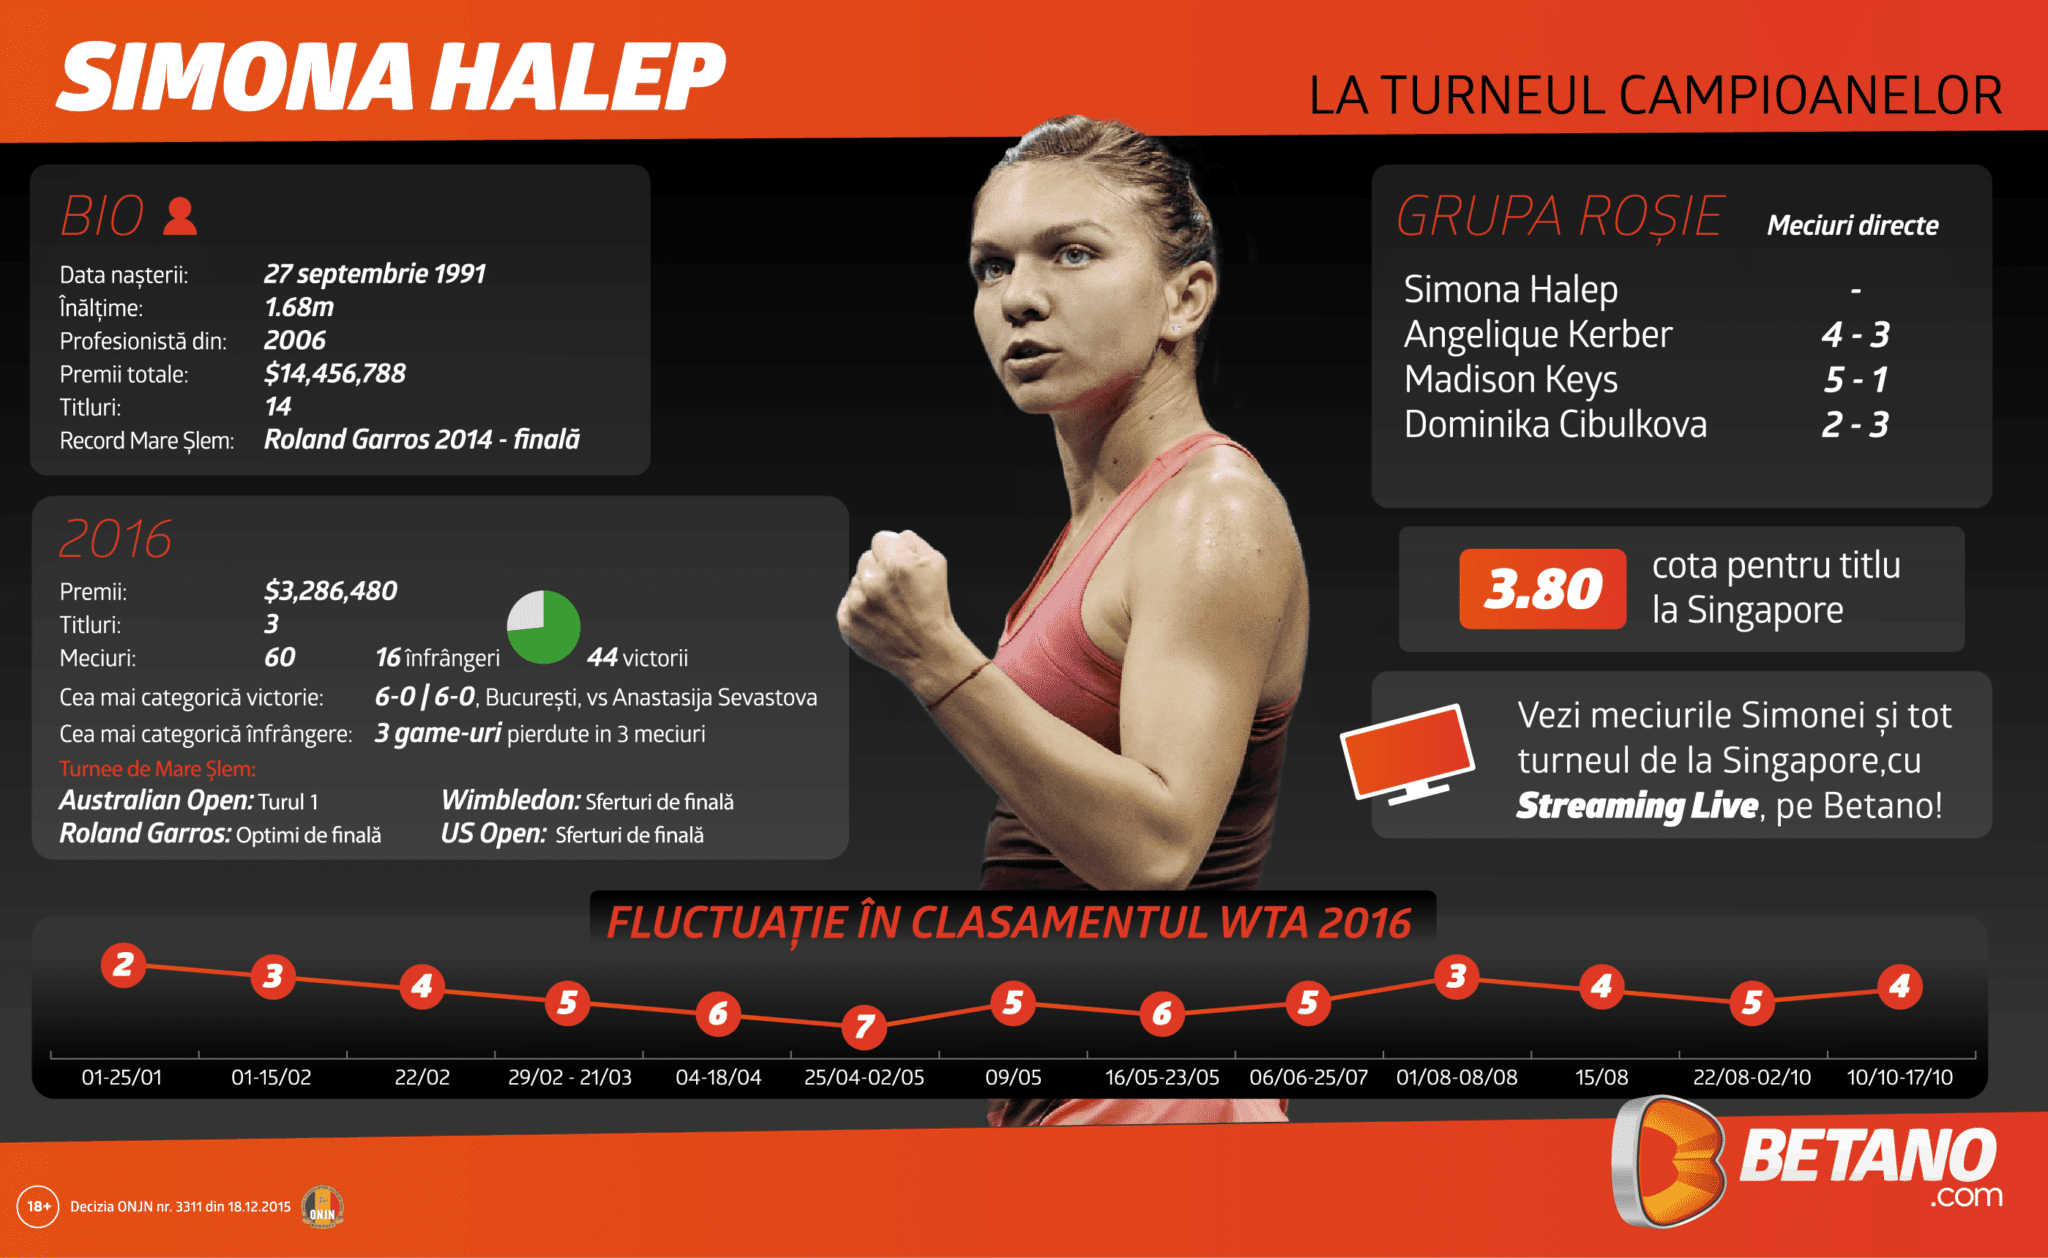 betano-halep_singapore-infographic